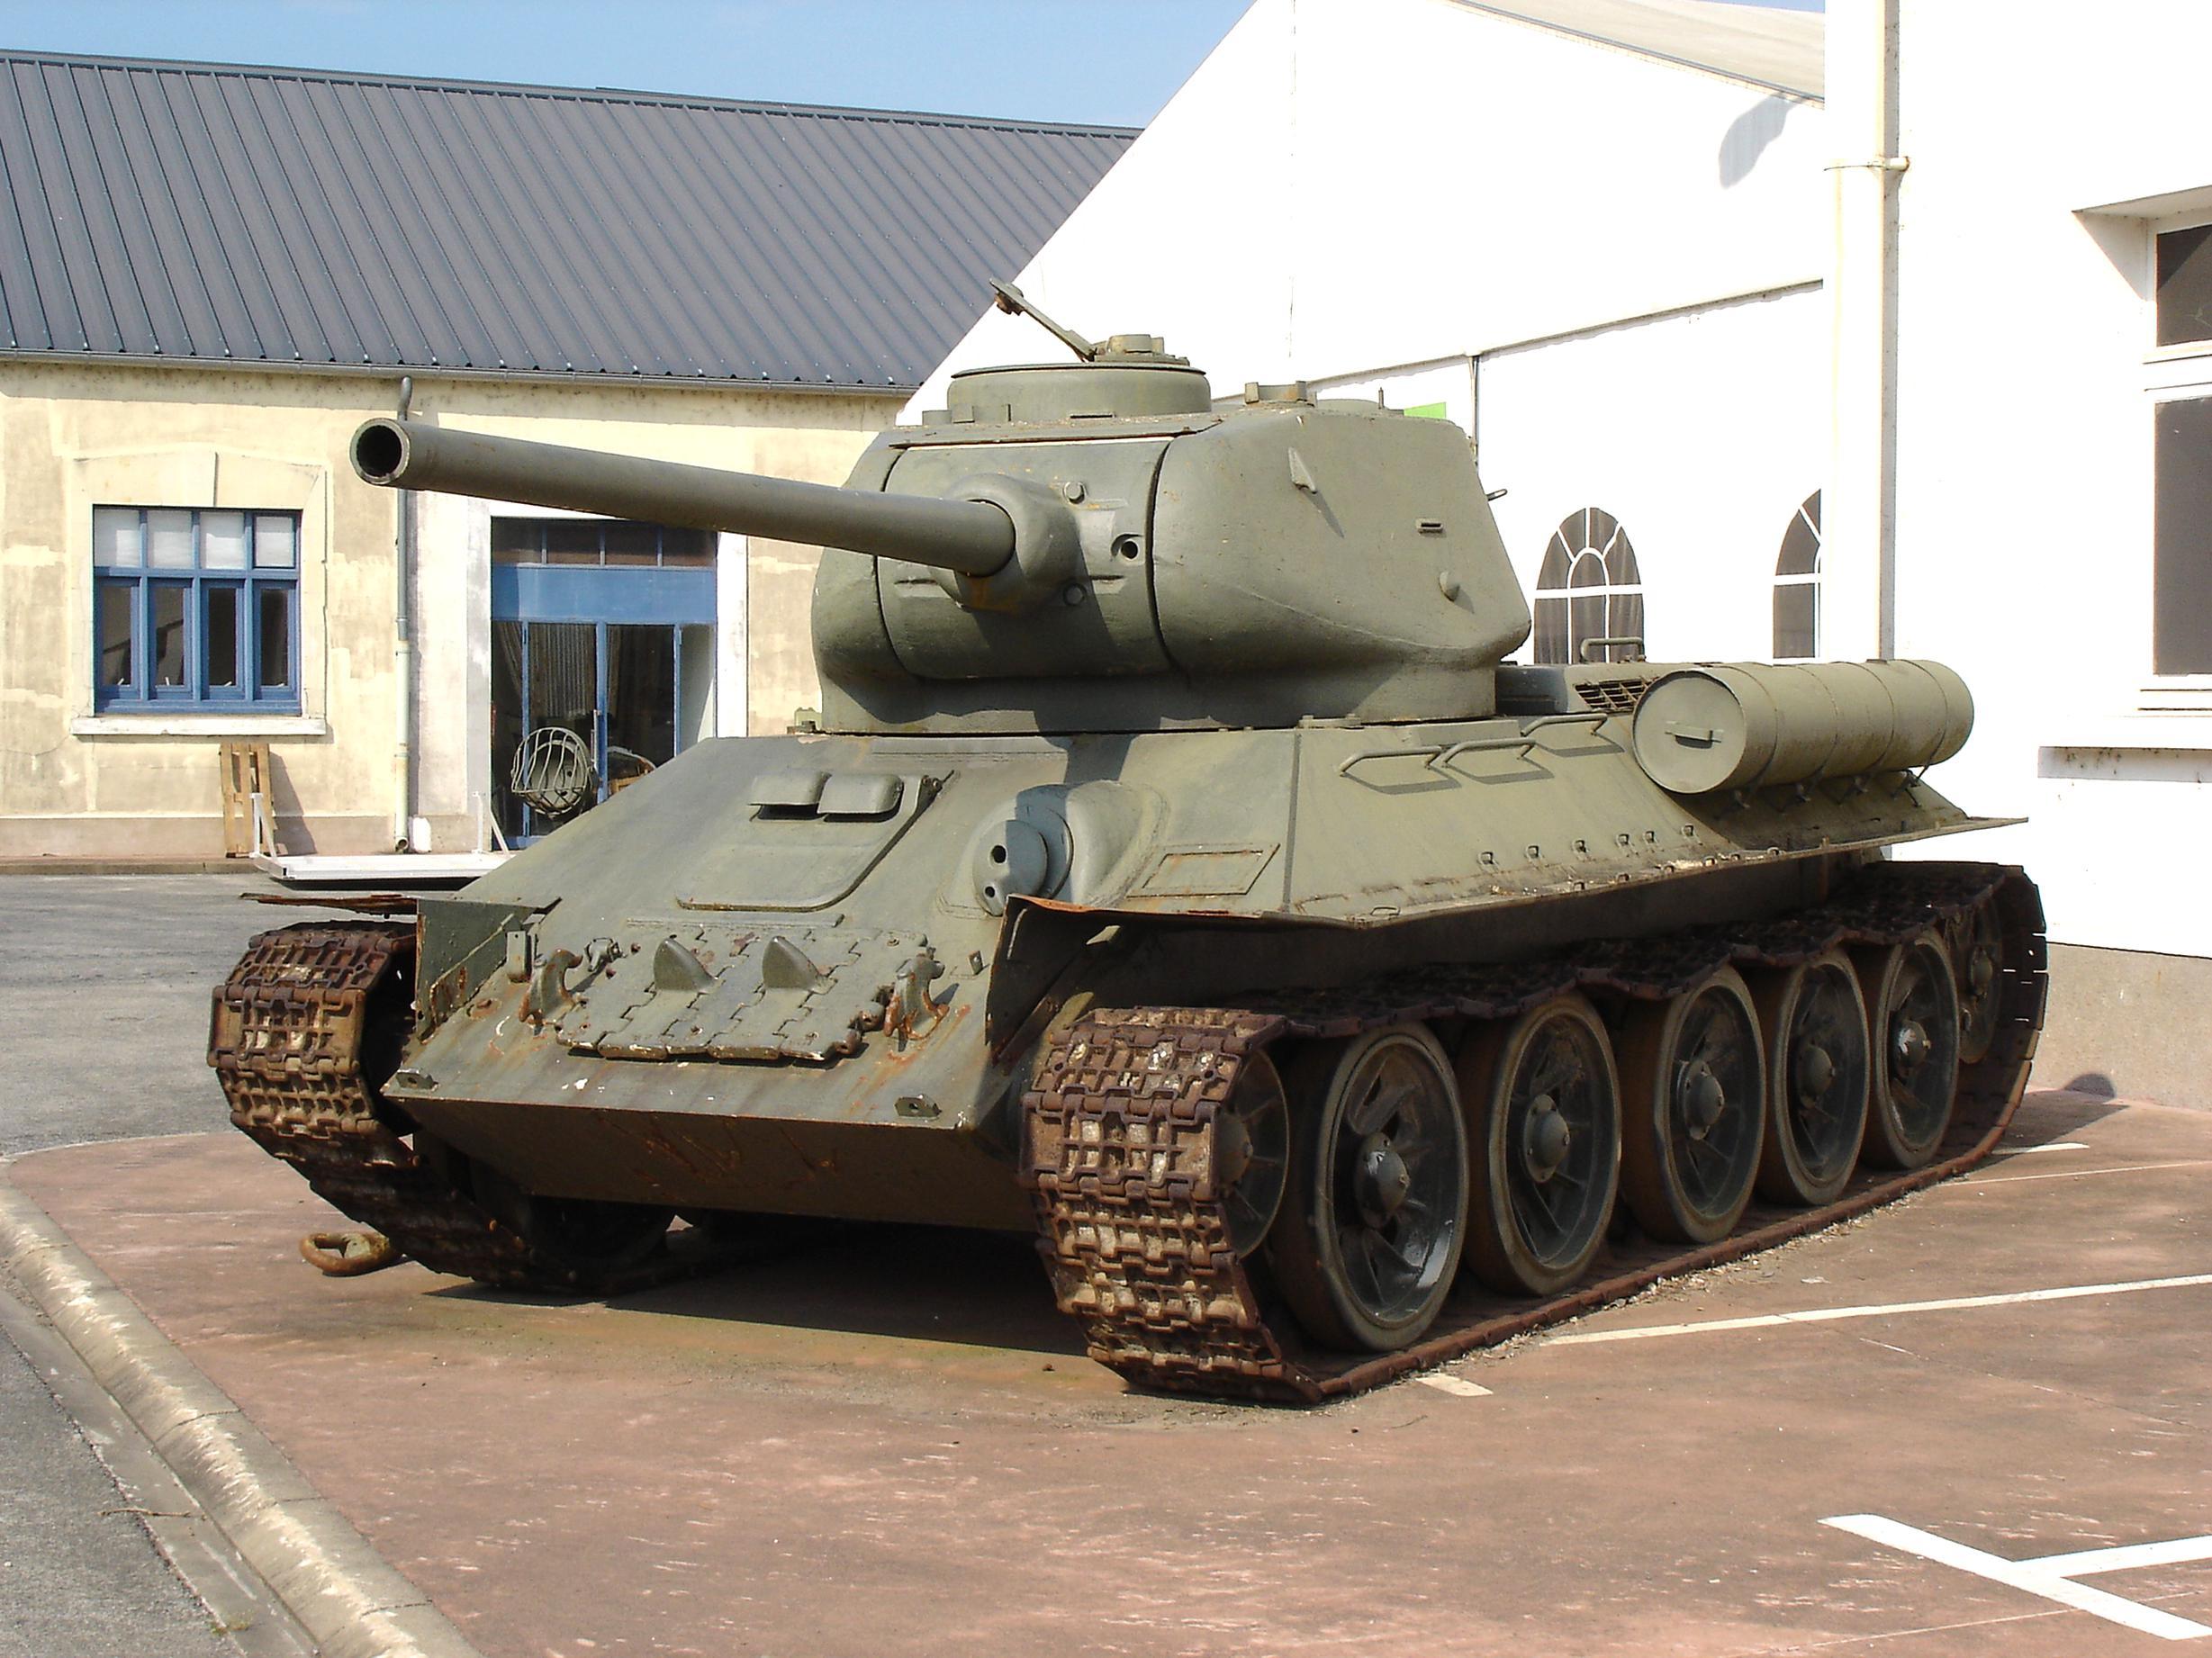 YUGIOH x 3 Oni Tank T-34 1st Edition Near Mint PSV-059 Common